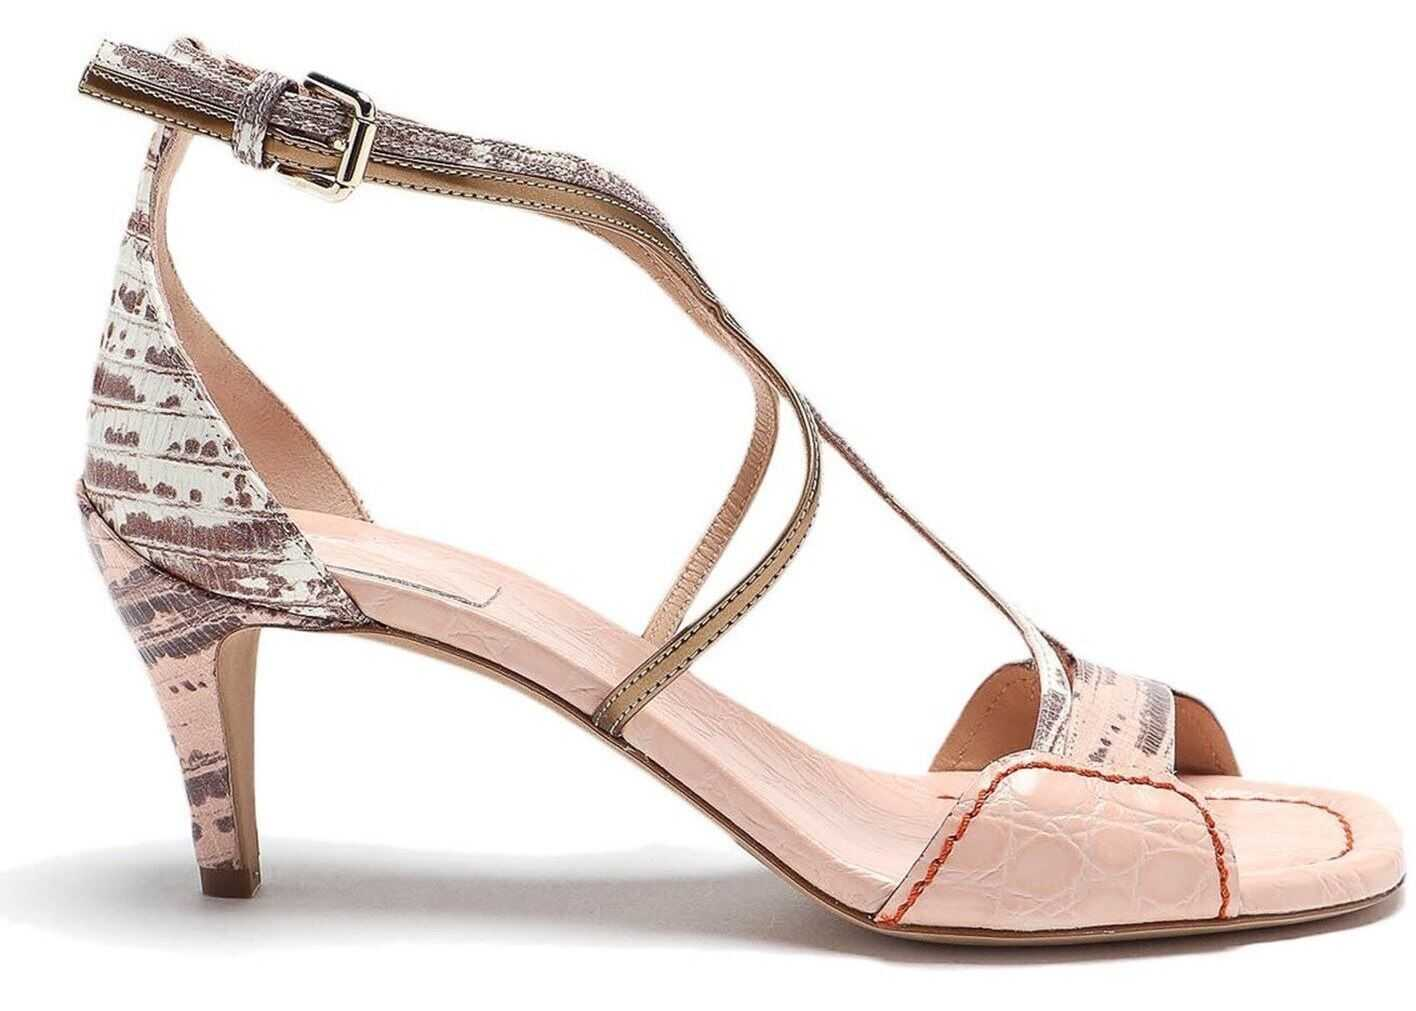 Chloe Carla Heeled Sandals In Pink Pink